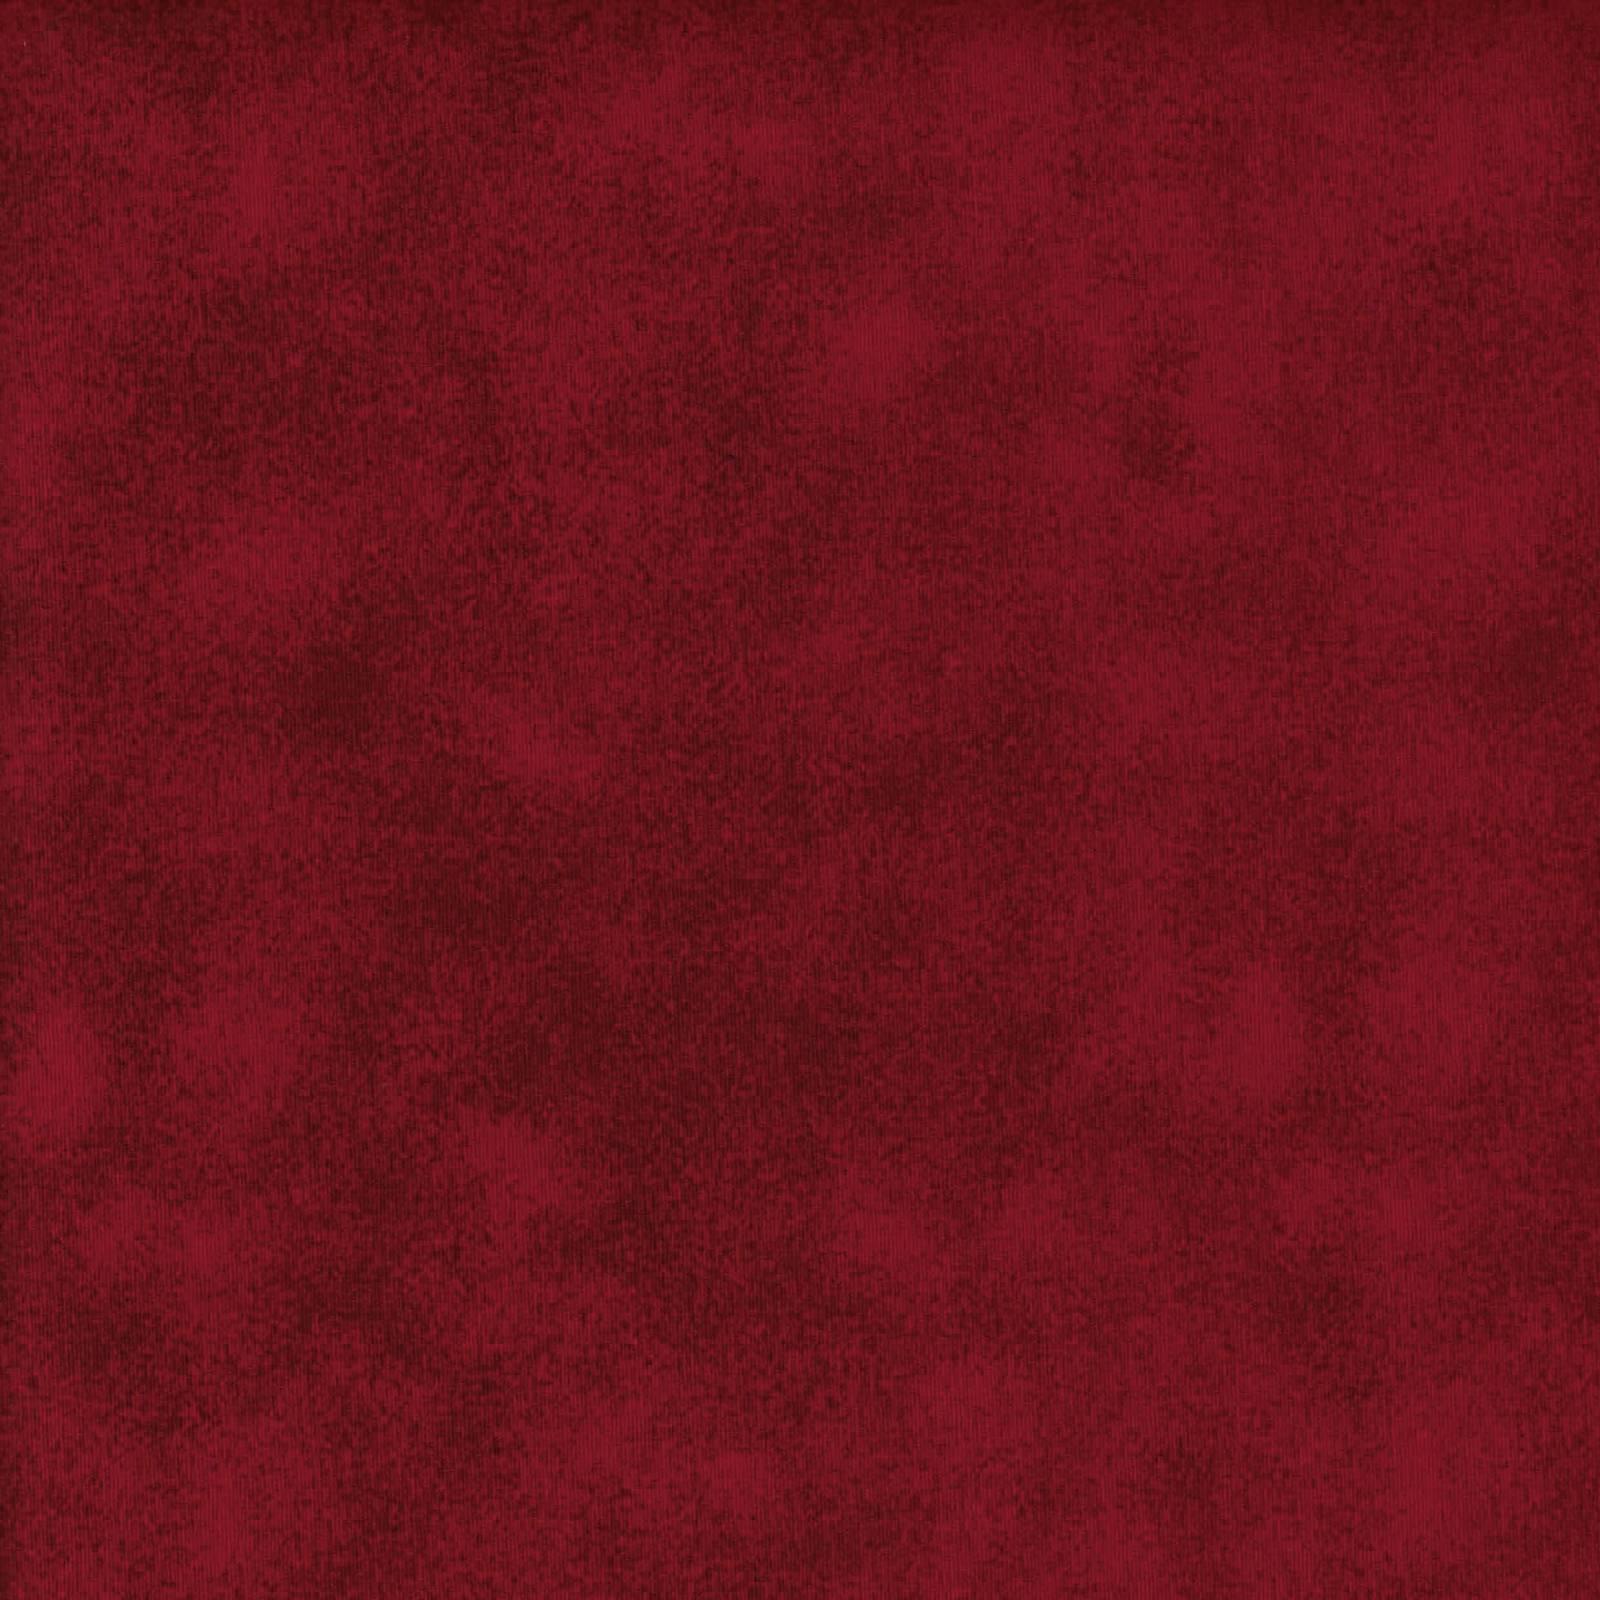 Poeira Vermelho Escarlate Ref. 1131 cor 106 Peripan - Armarinhos Nodari